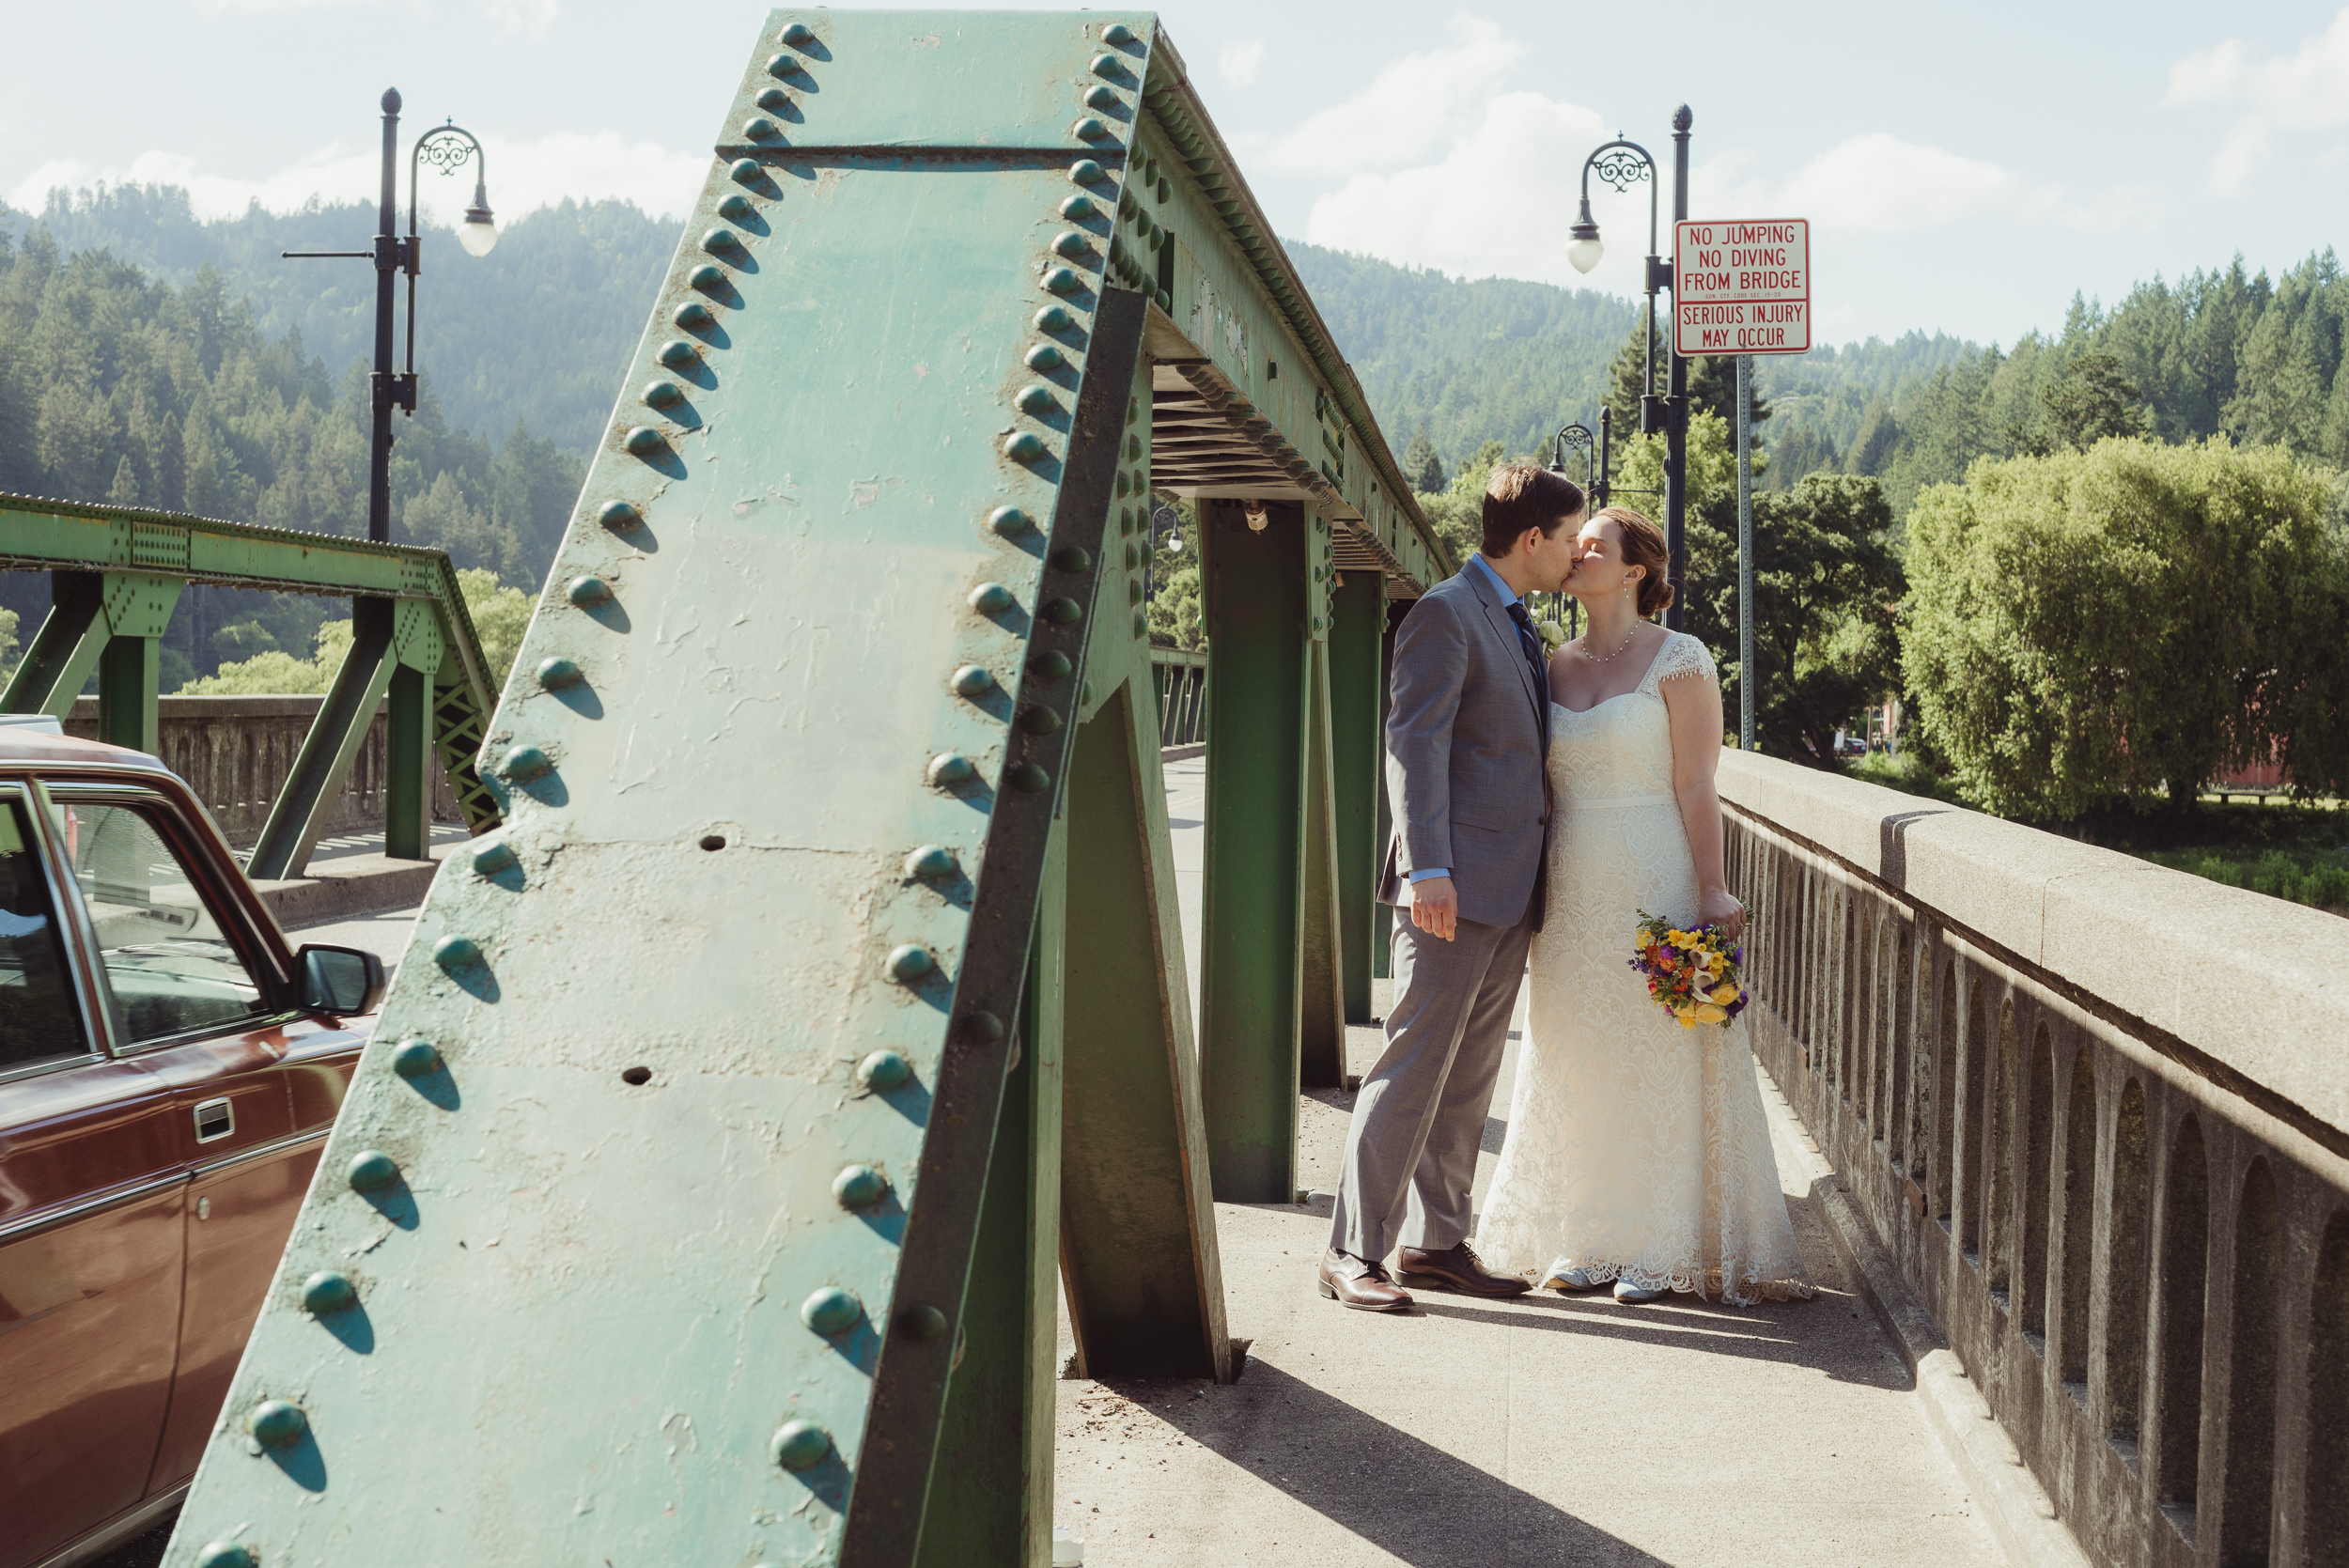 060-highland-dell-lodge-russian-river-wedding-vivianchen-414.jpg